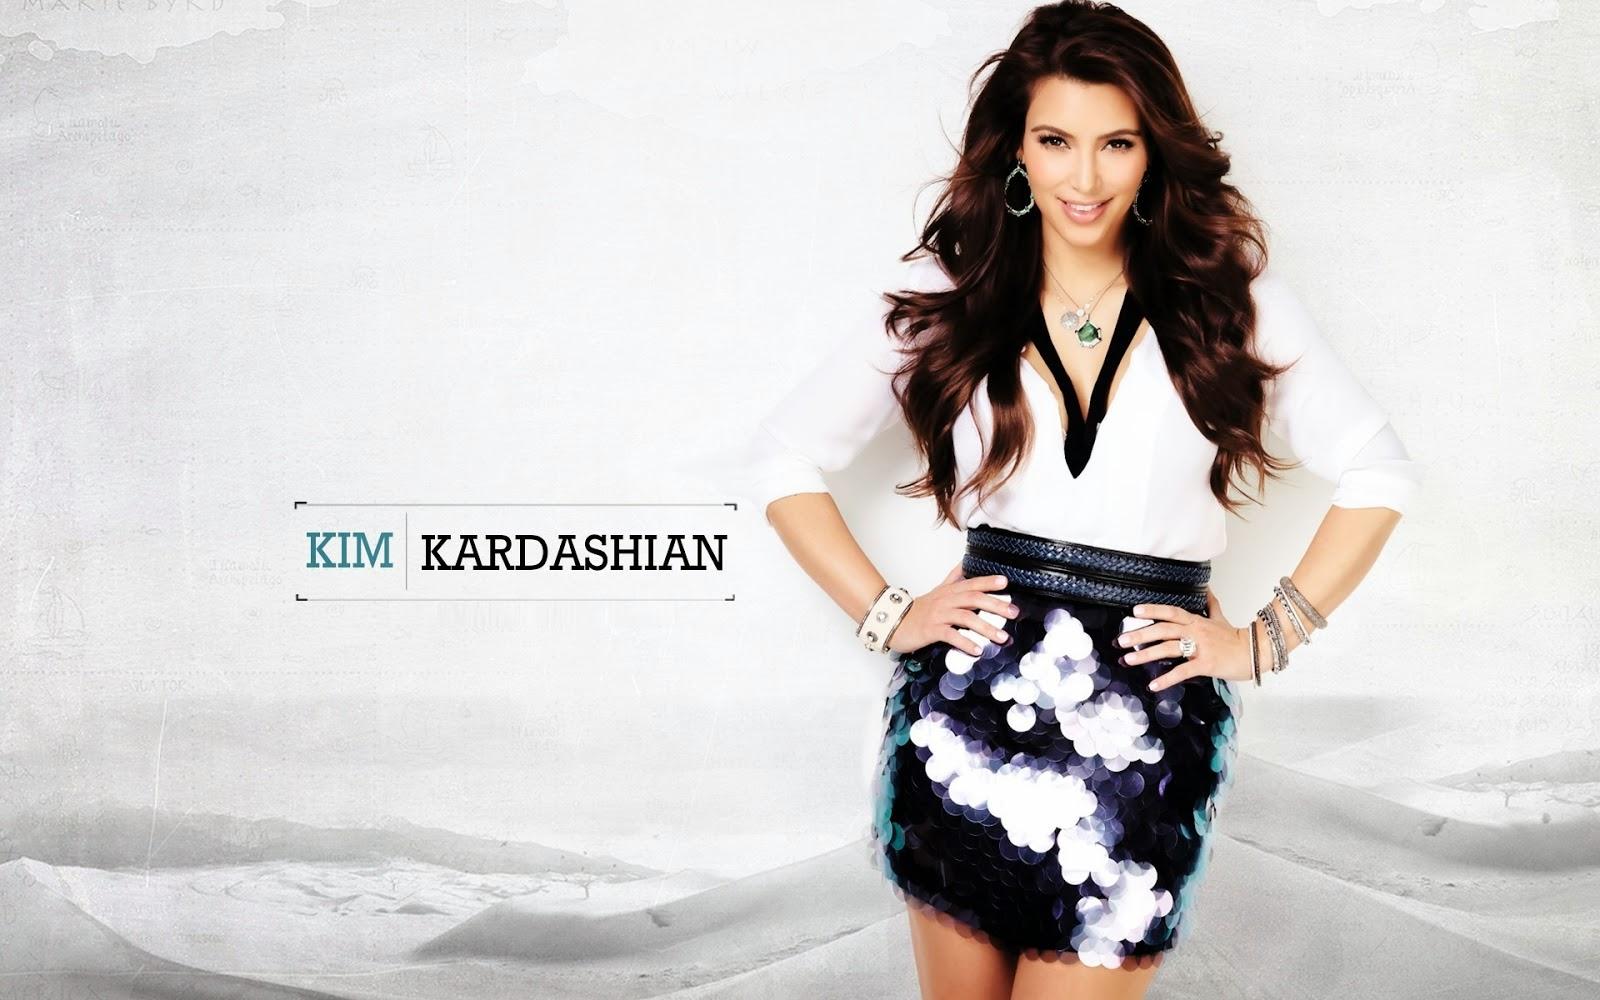 Amazing Kim Kardashian Wallpaper HD 1600x1000